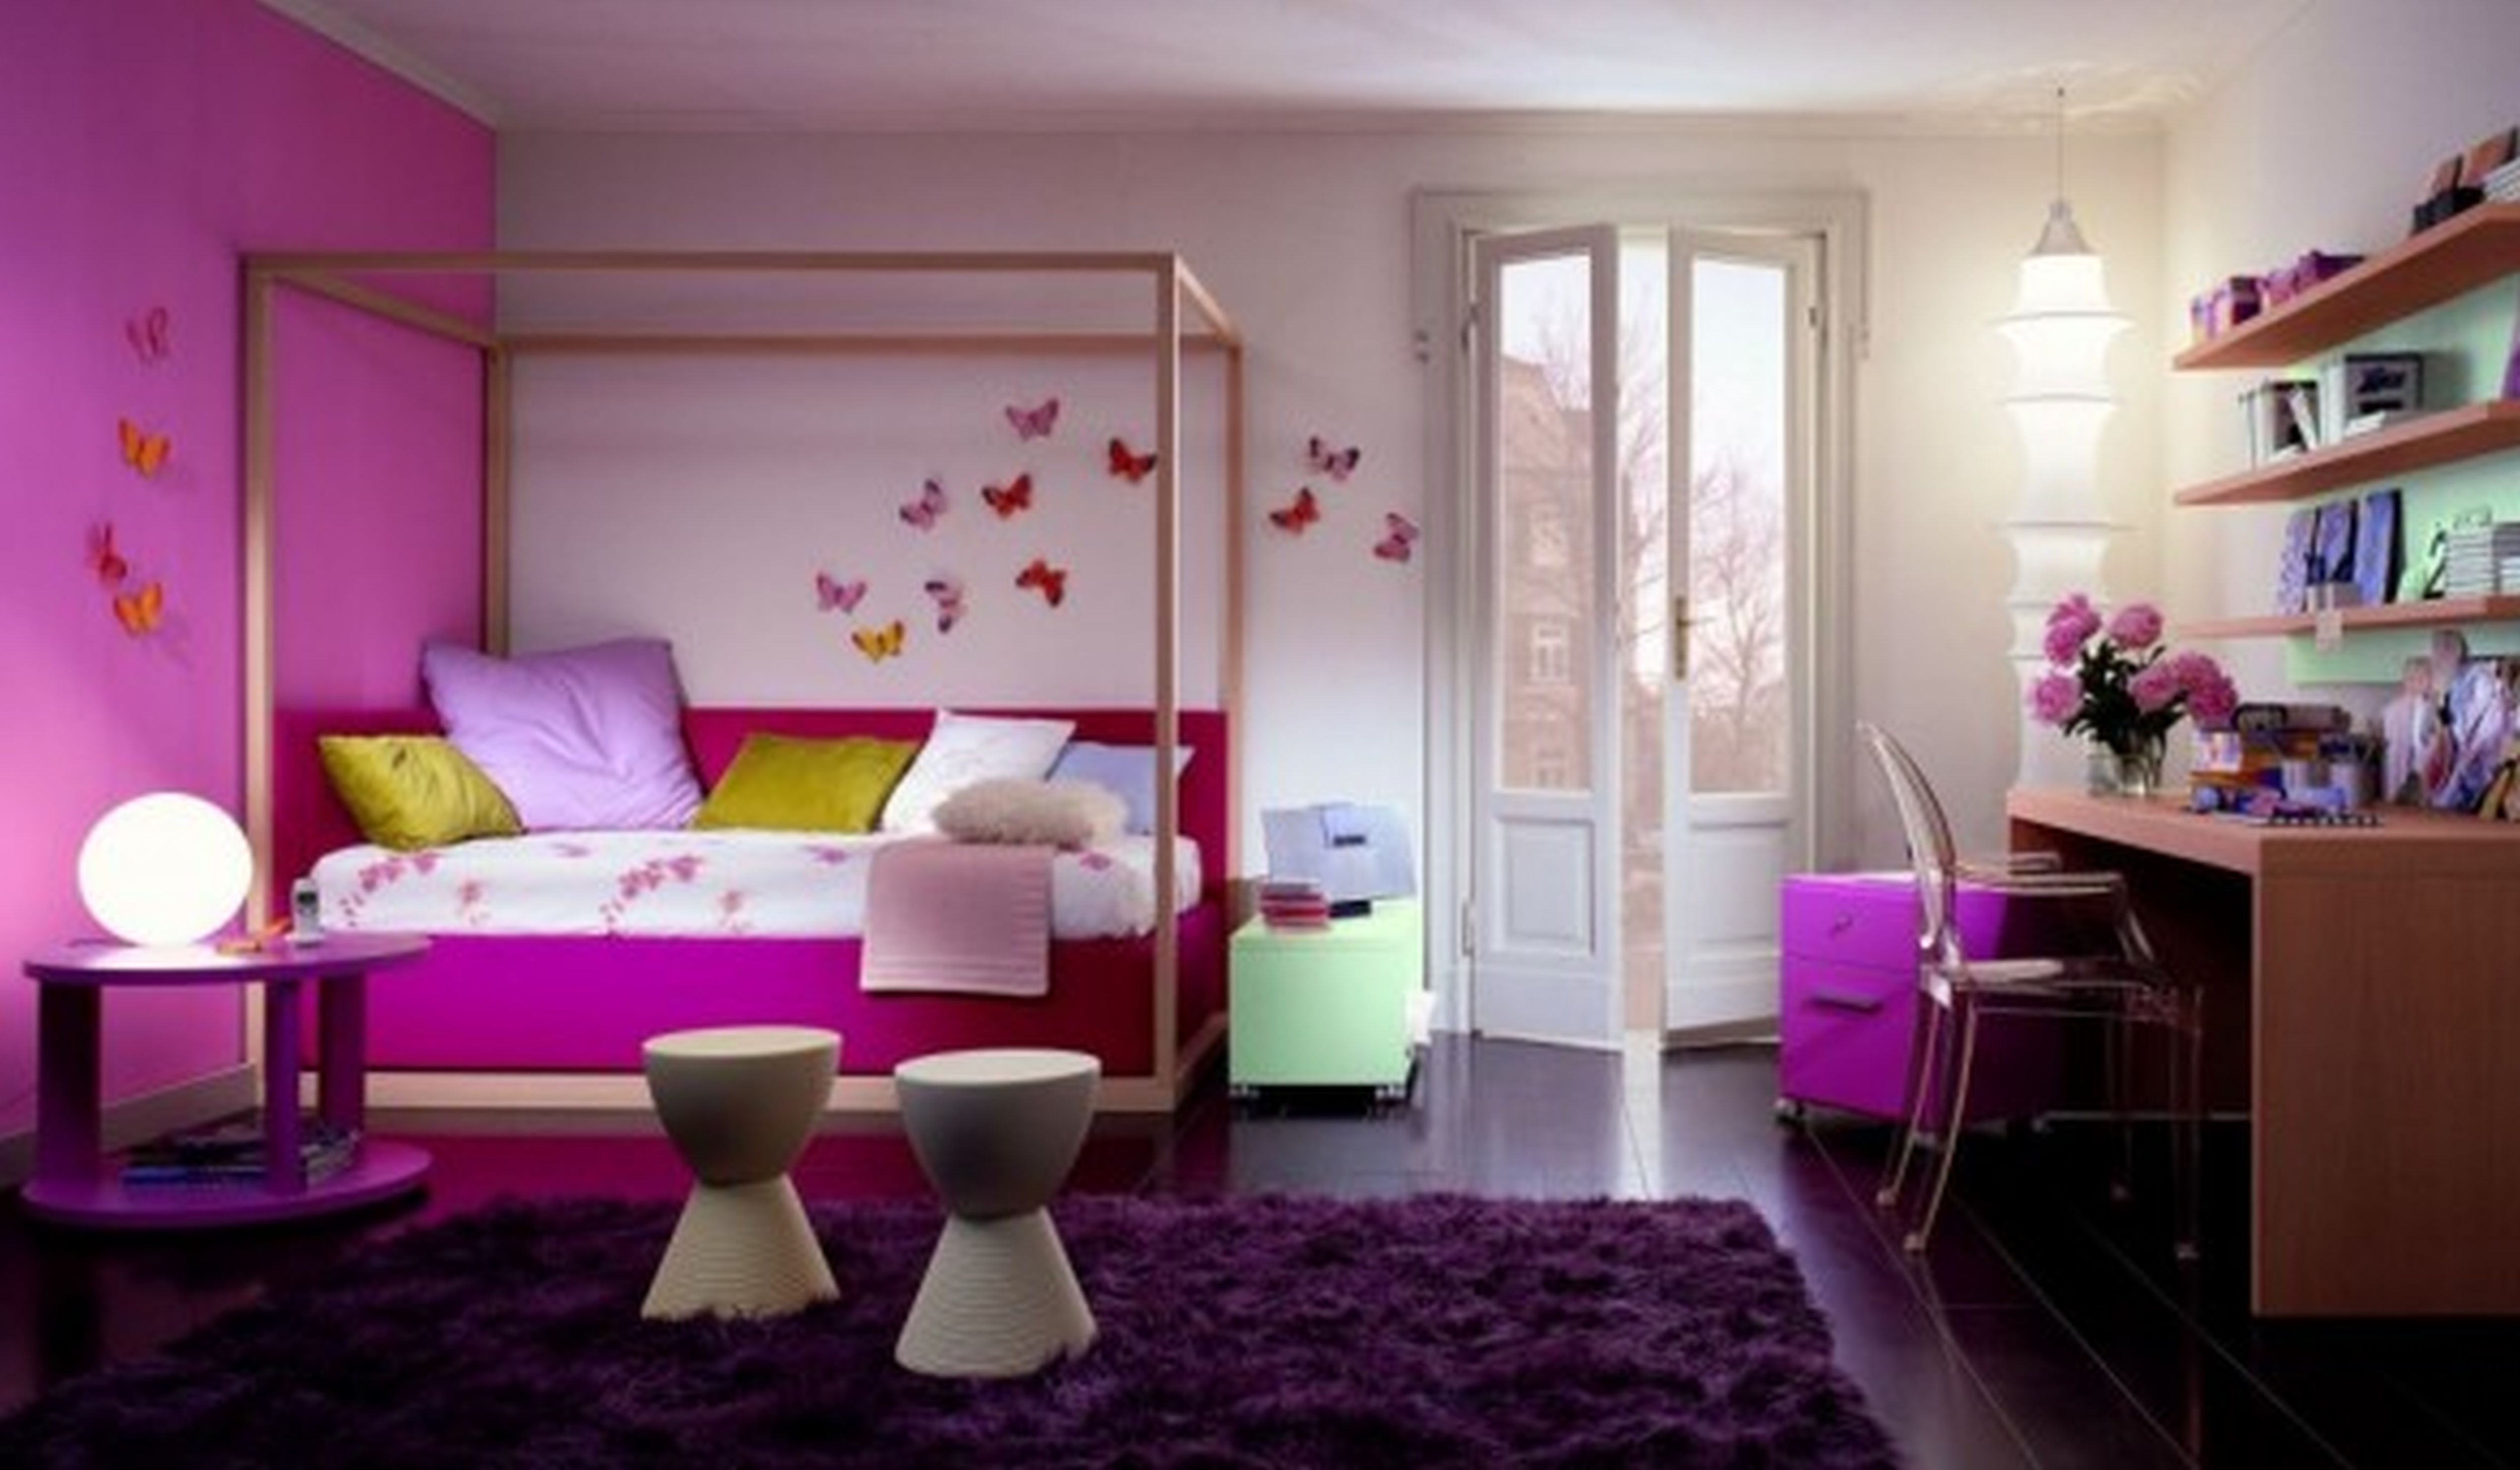 Bedrooms,Fancy Interiorthelatestdesignfor As Well As Cute Girl Bedroom  Designs And Cute Girl Bedroom Ideas